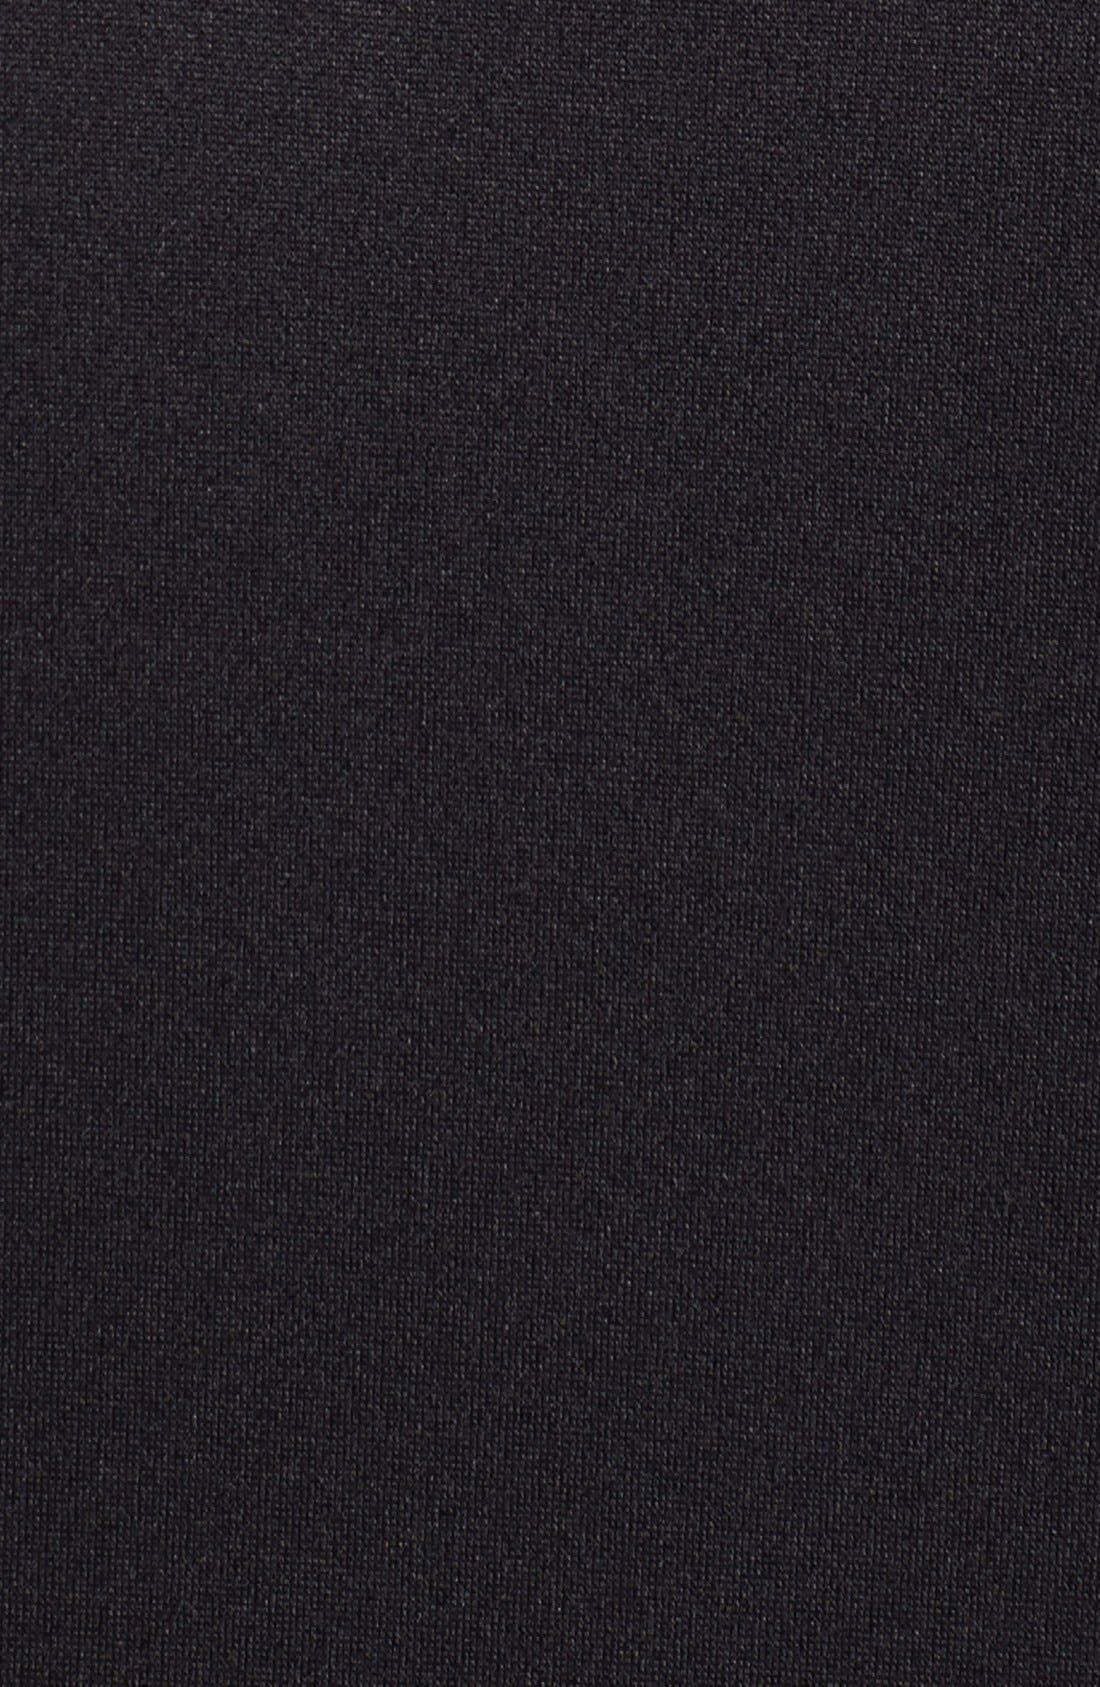 Alternate Image 3  - The North Face 'Cowells - Park Fit' Fleece Hoodie